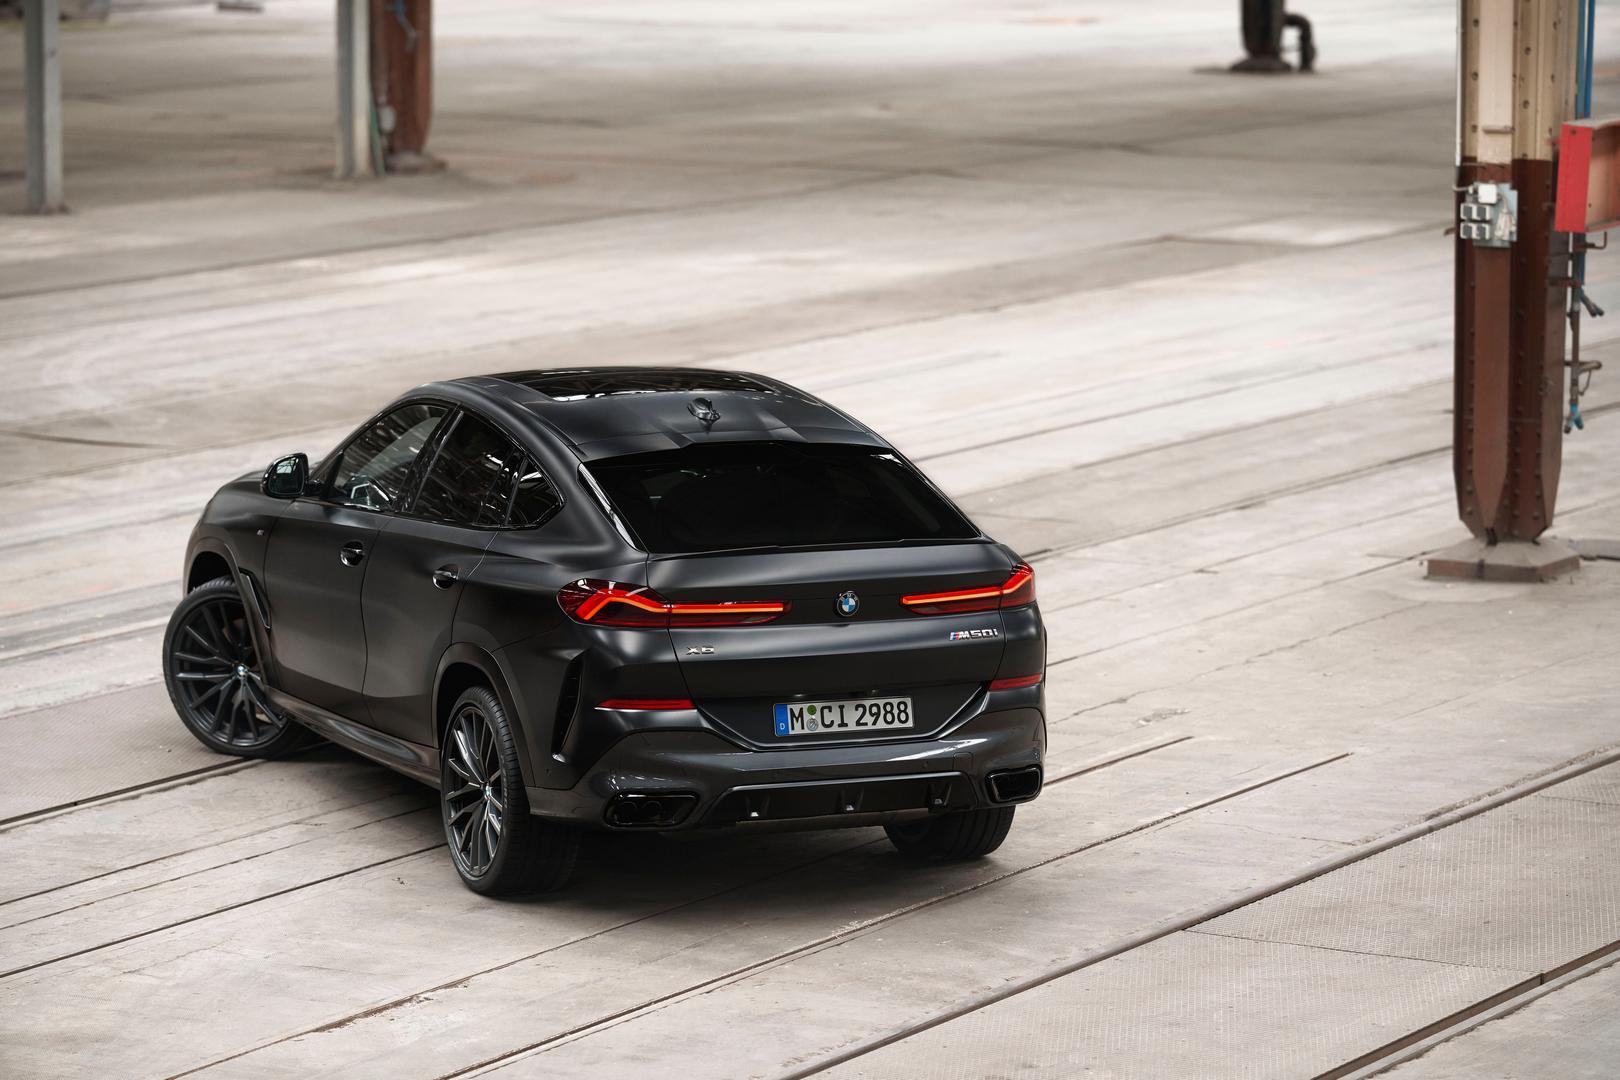 2022 BMW X6 Black Vermilion